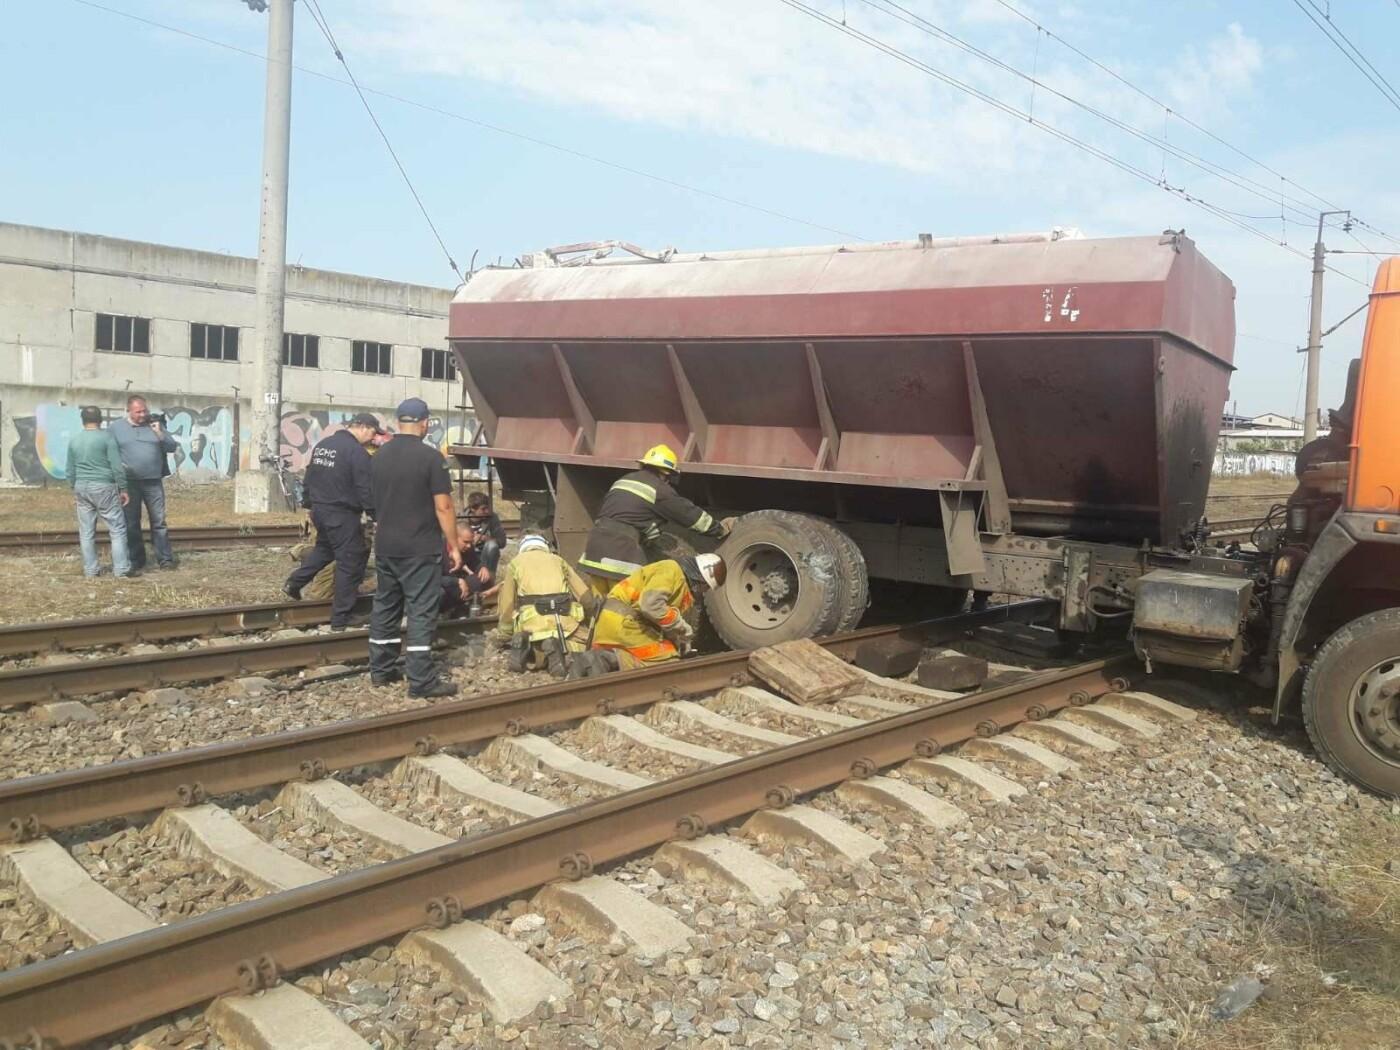 В Мелитополе на железнодорожных путях застрял грузовик, - ФОТО, фото-2